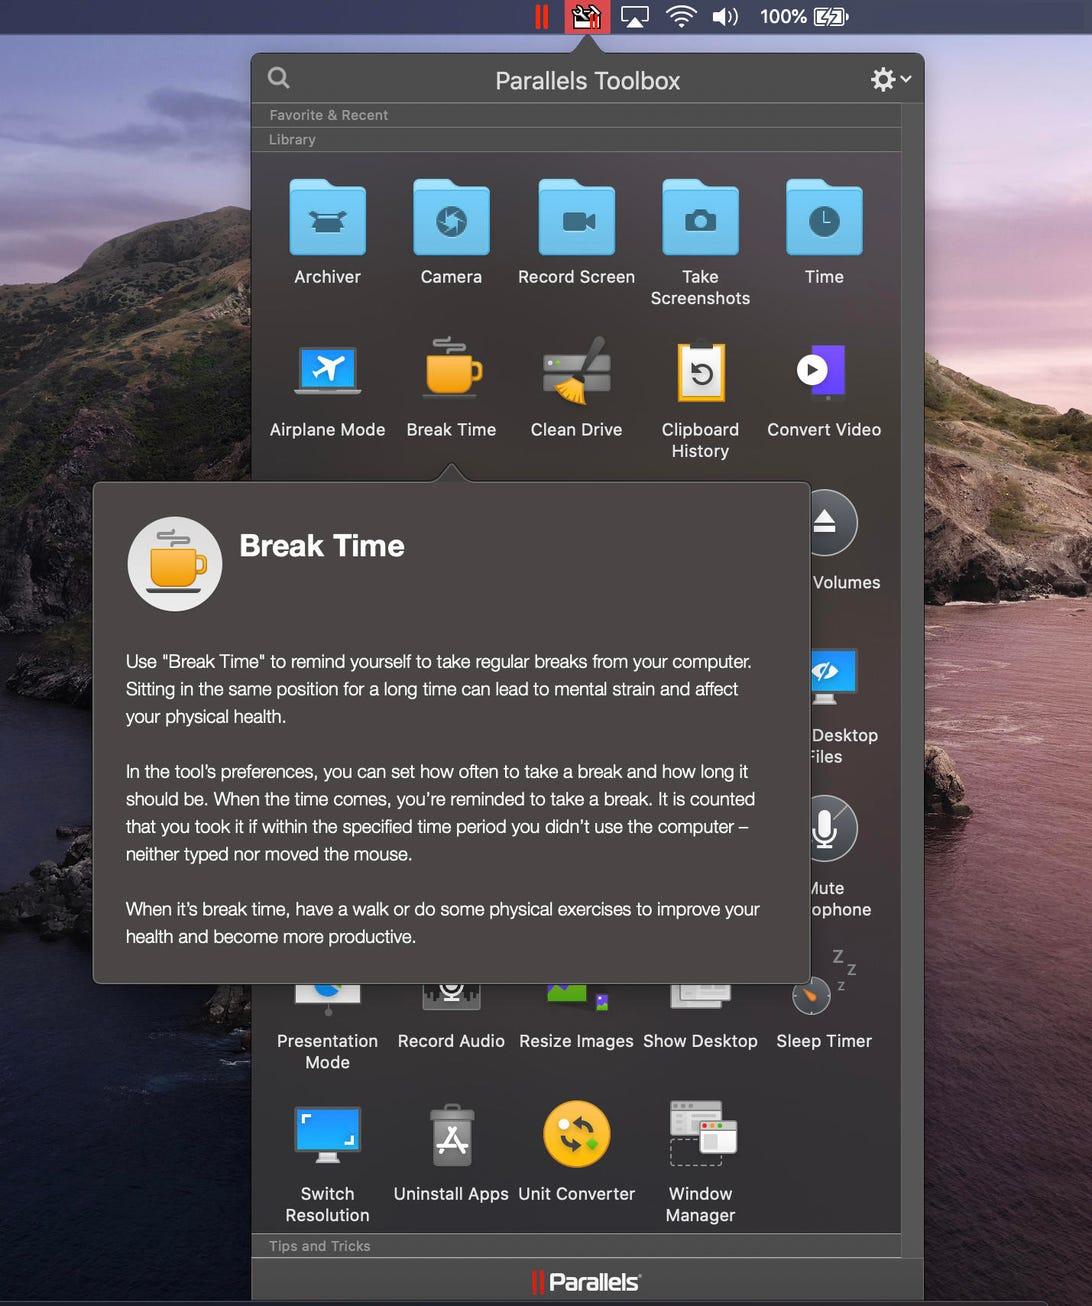 parallels-toolbox-break-time-macos-screenshot